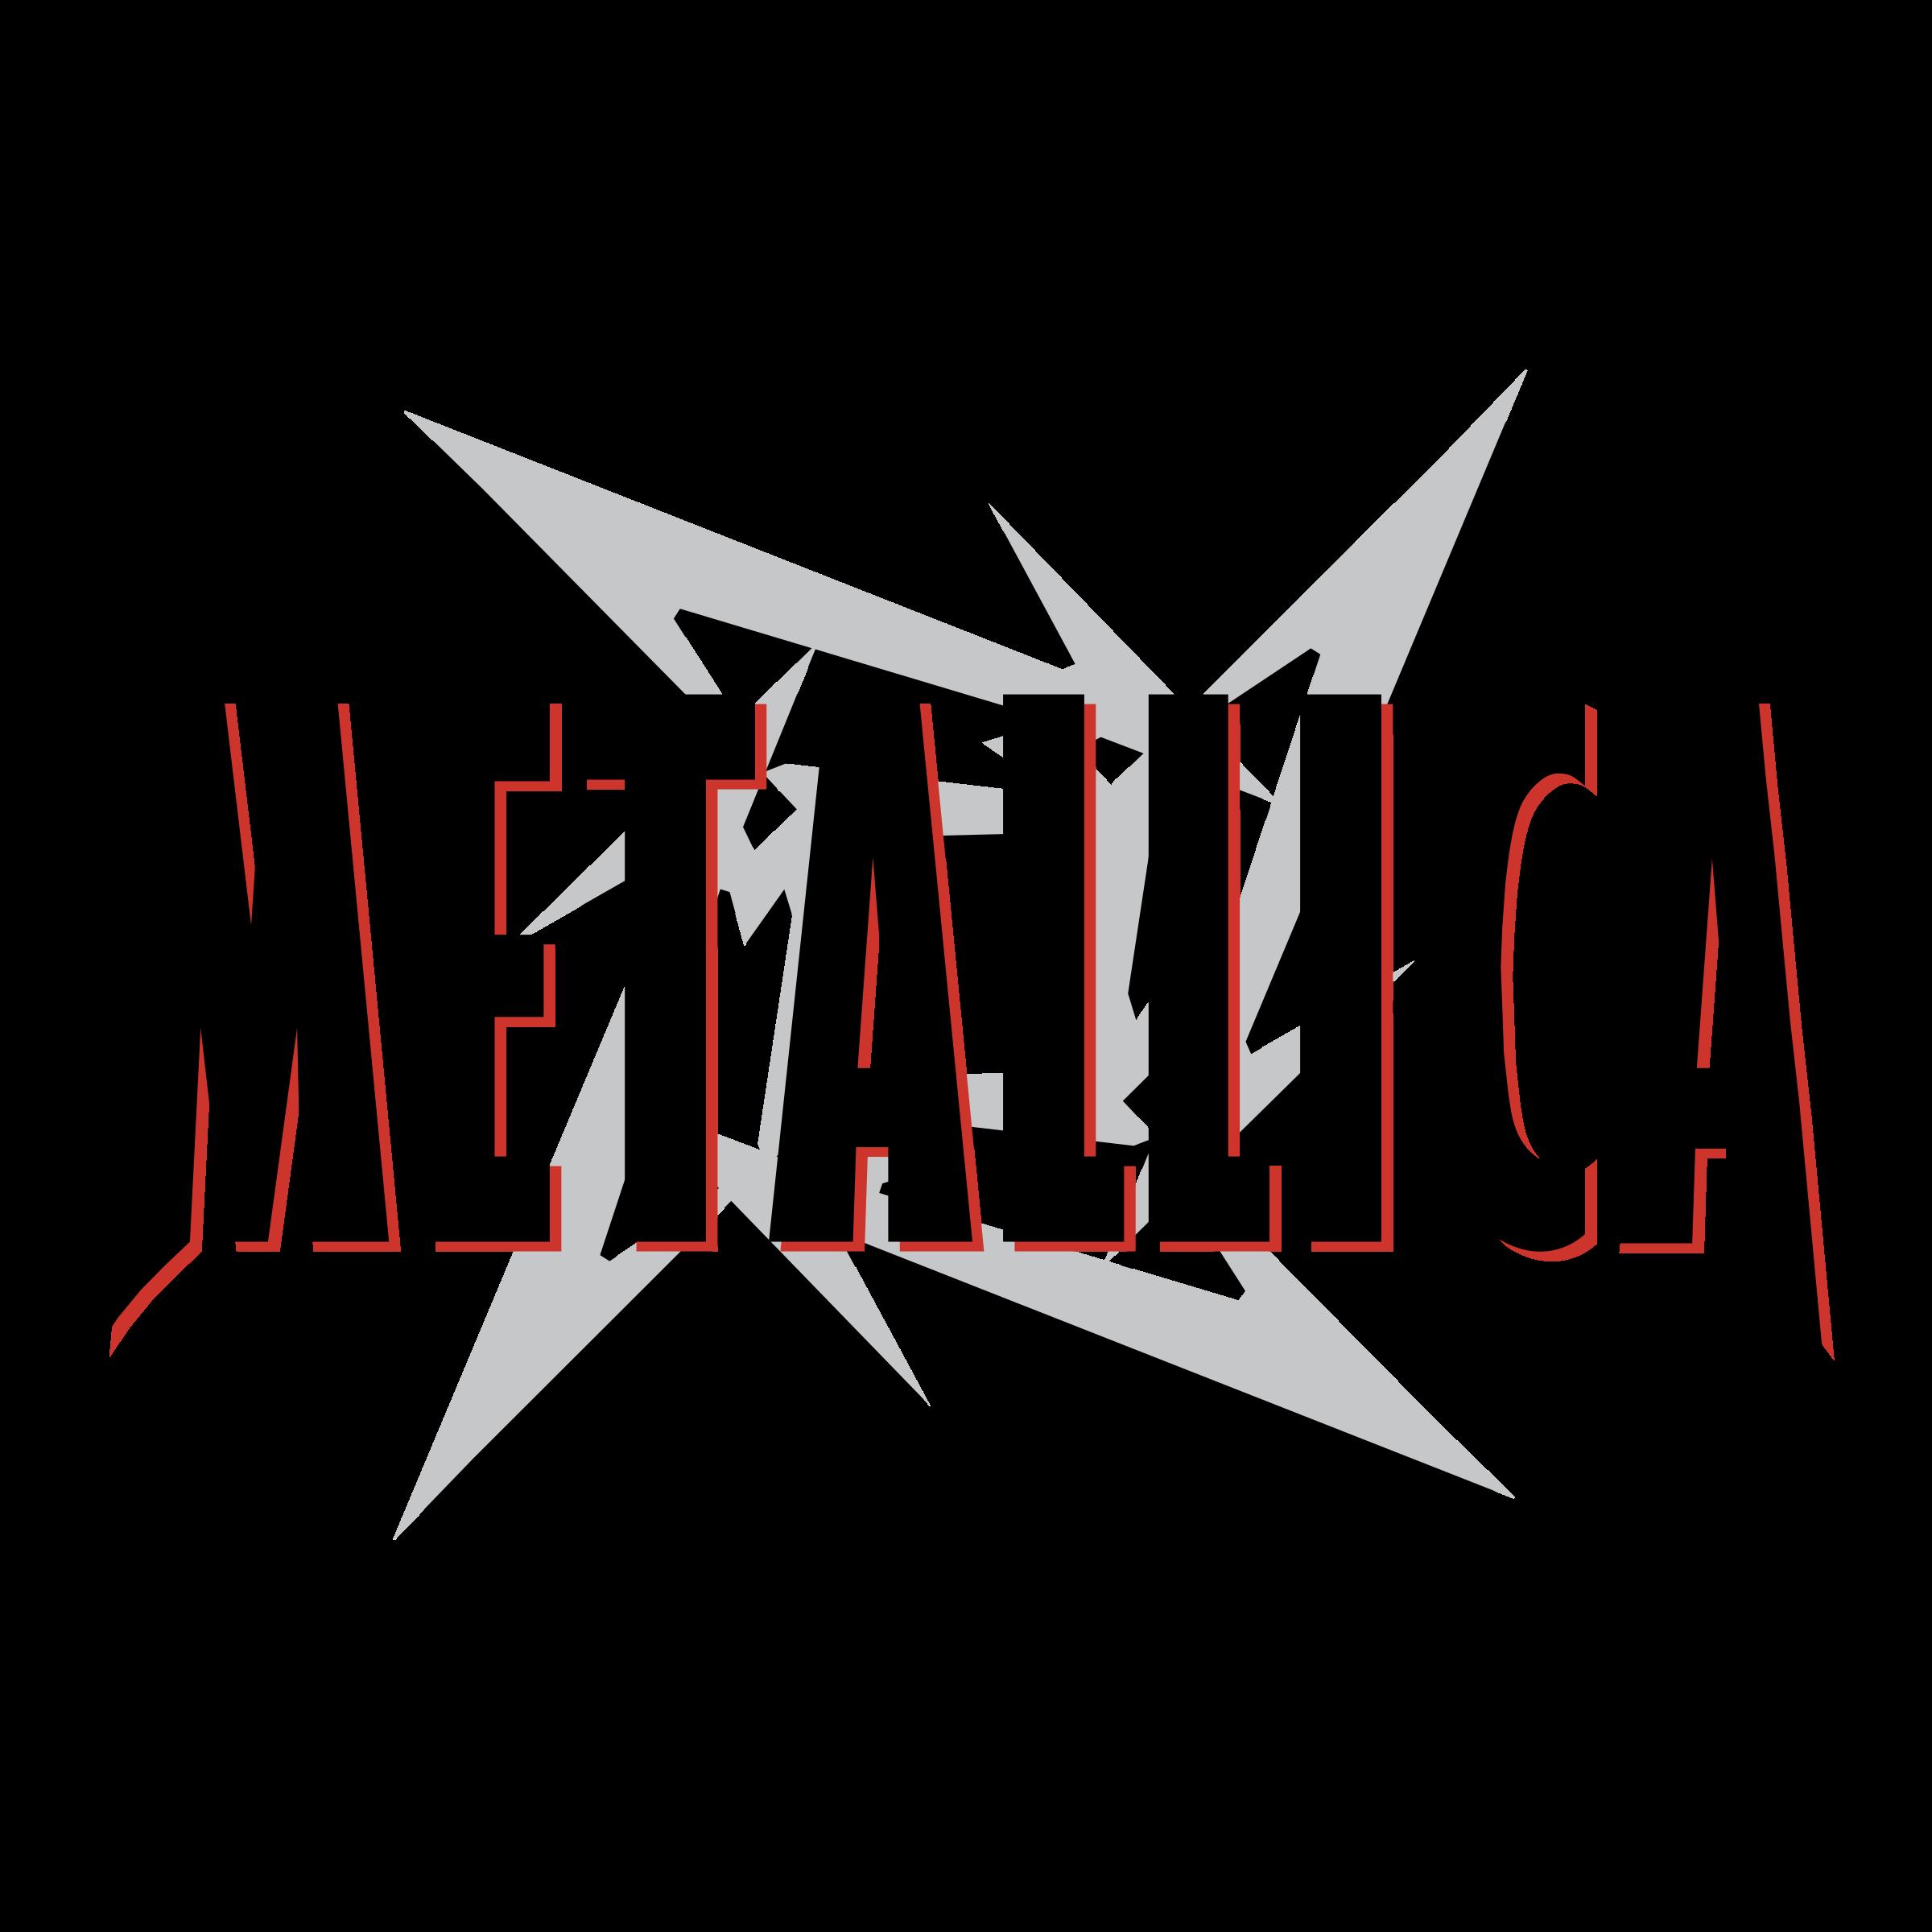 metallica logo png transparent svg vector freebie supply rh freebiesupply com metallic logos metallica logo svg